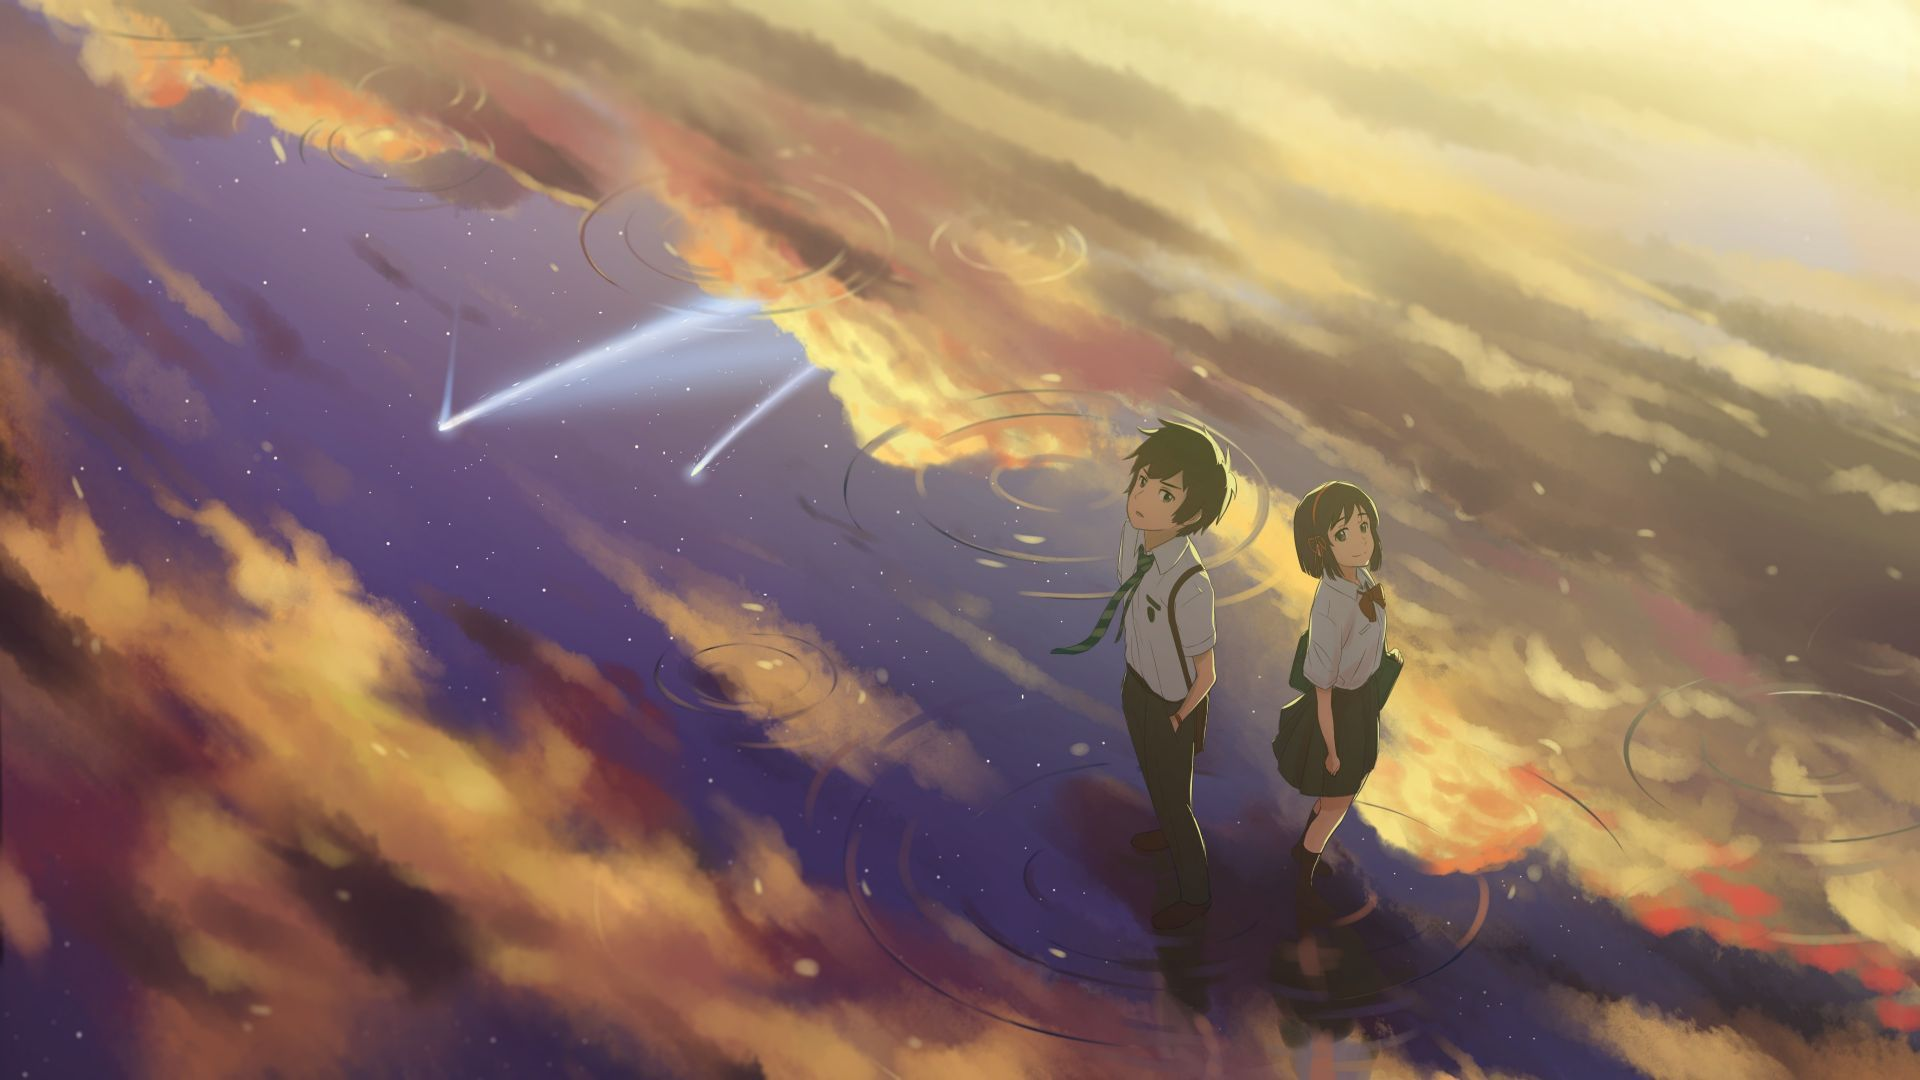 Pin De Swengelic En Anime Wallpaper Pc Wallpaper Para Pc Background 4k Arte De Anime